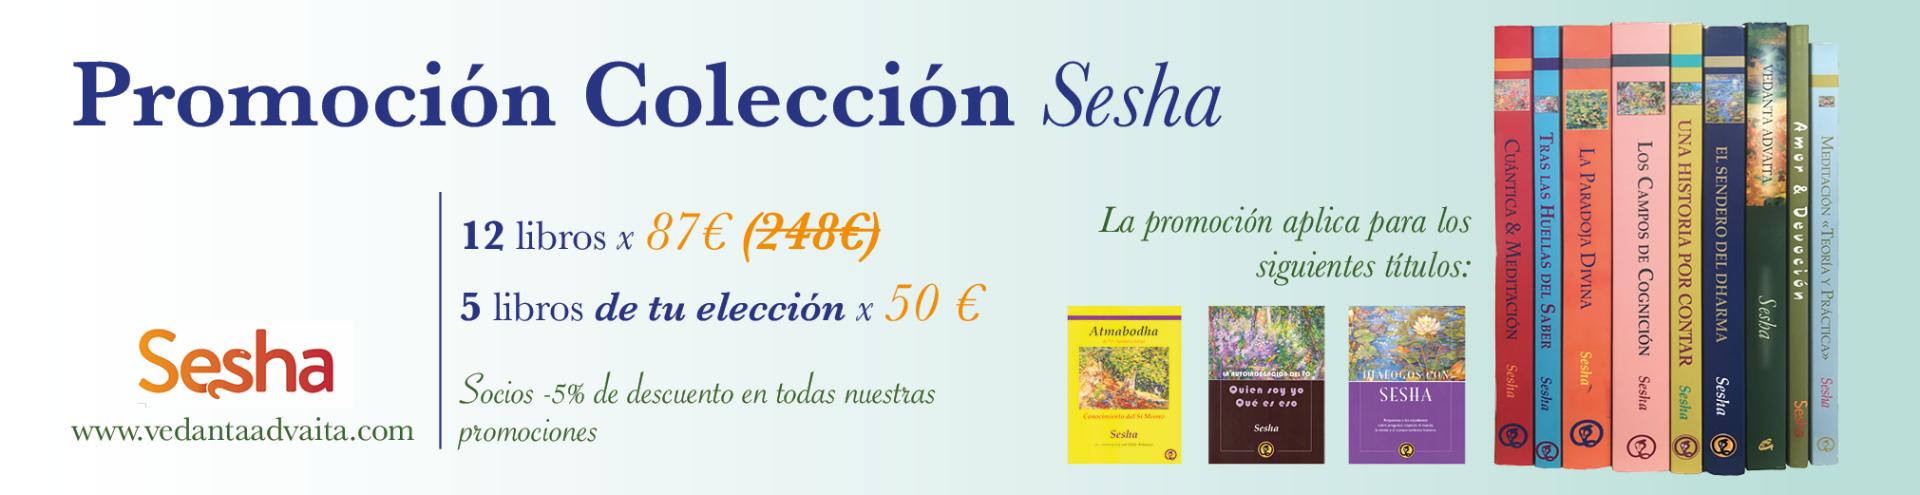 banners_promocion coleccion sesha